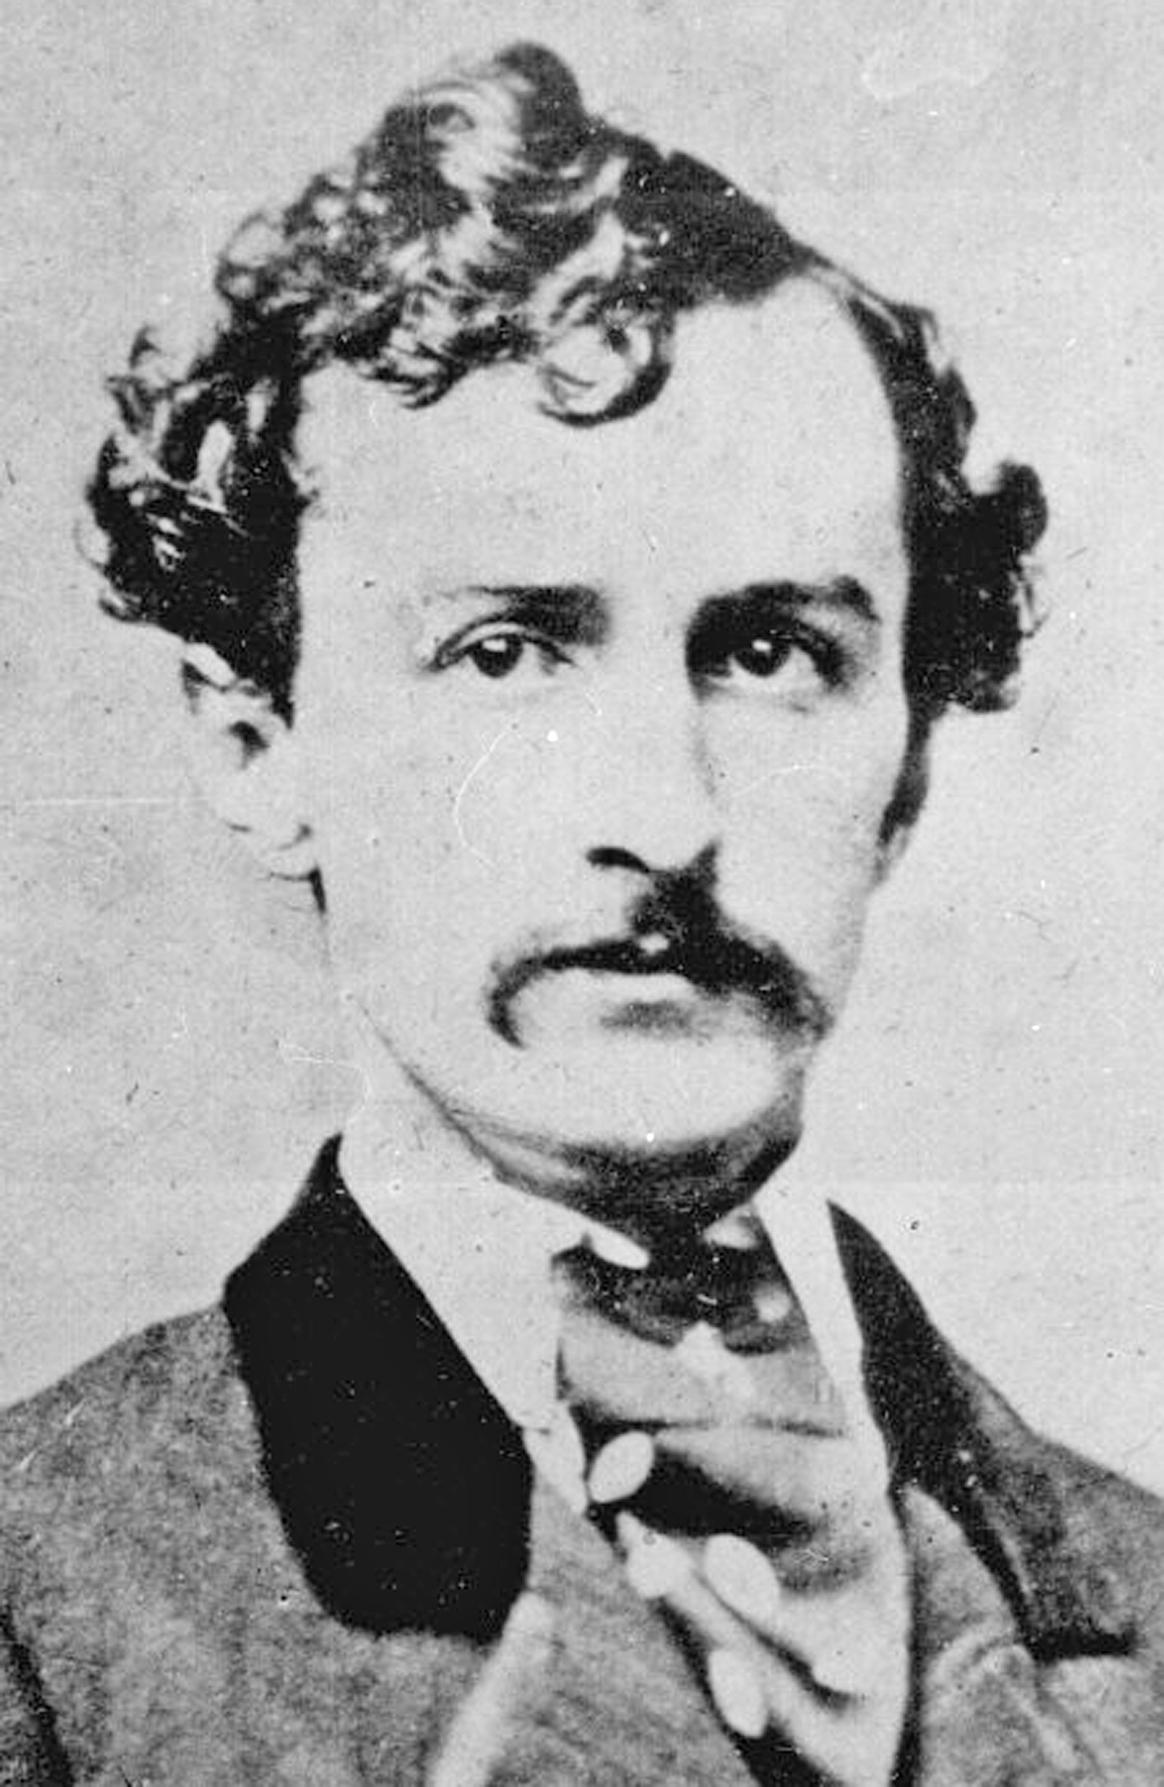 BOOTH, JOHN WILKES portrait